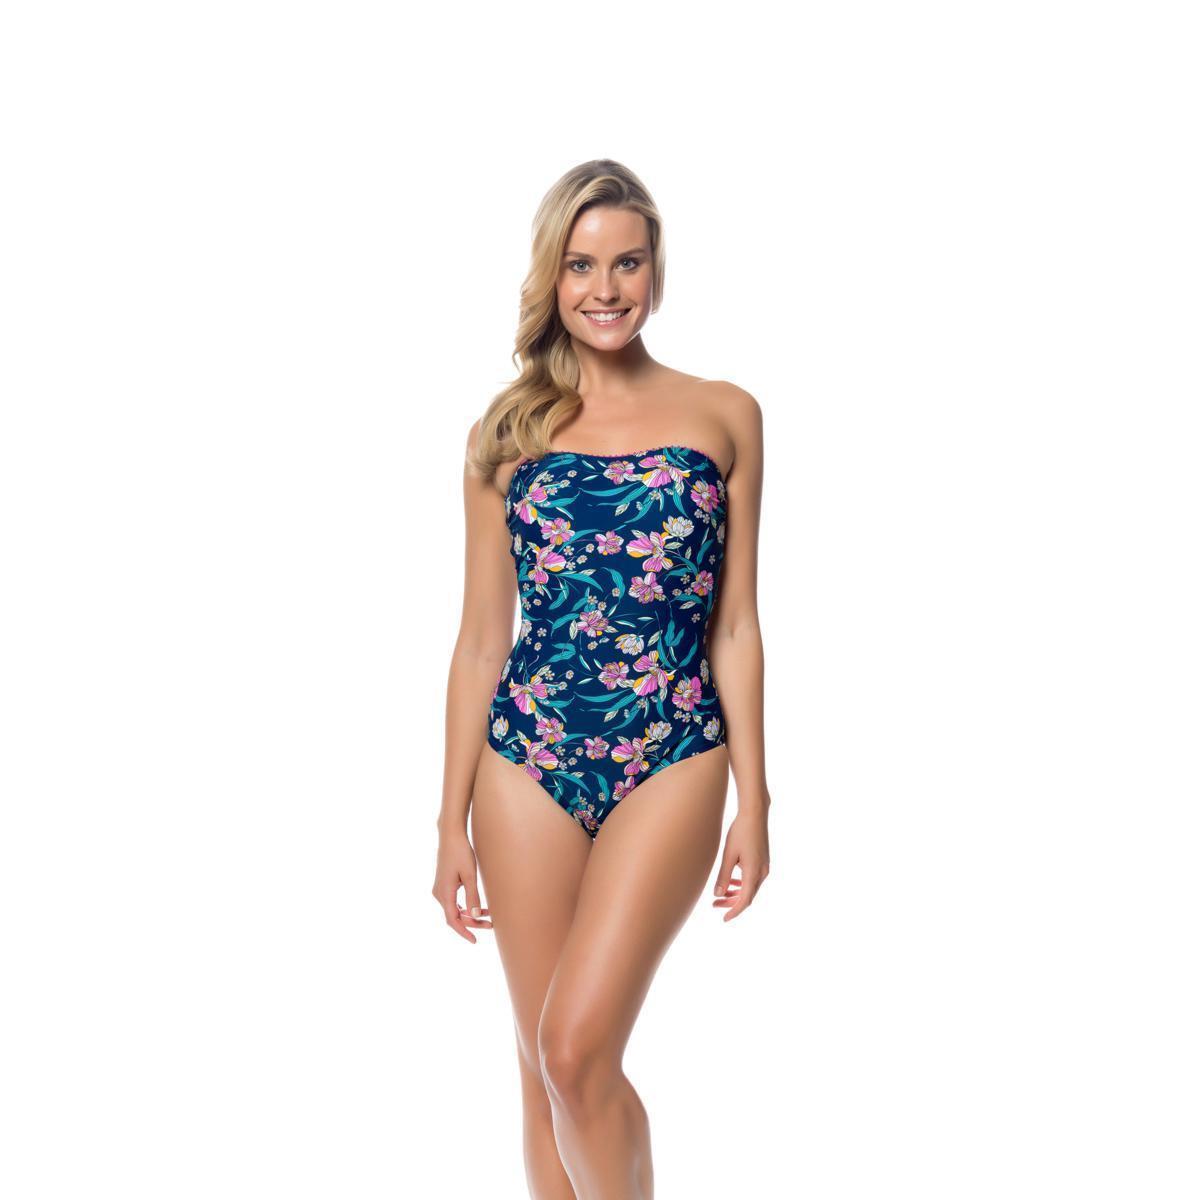 Jessica Simpson Women's Sweet Treat One-Piece Swimsuit 474299-AJ (NI)